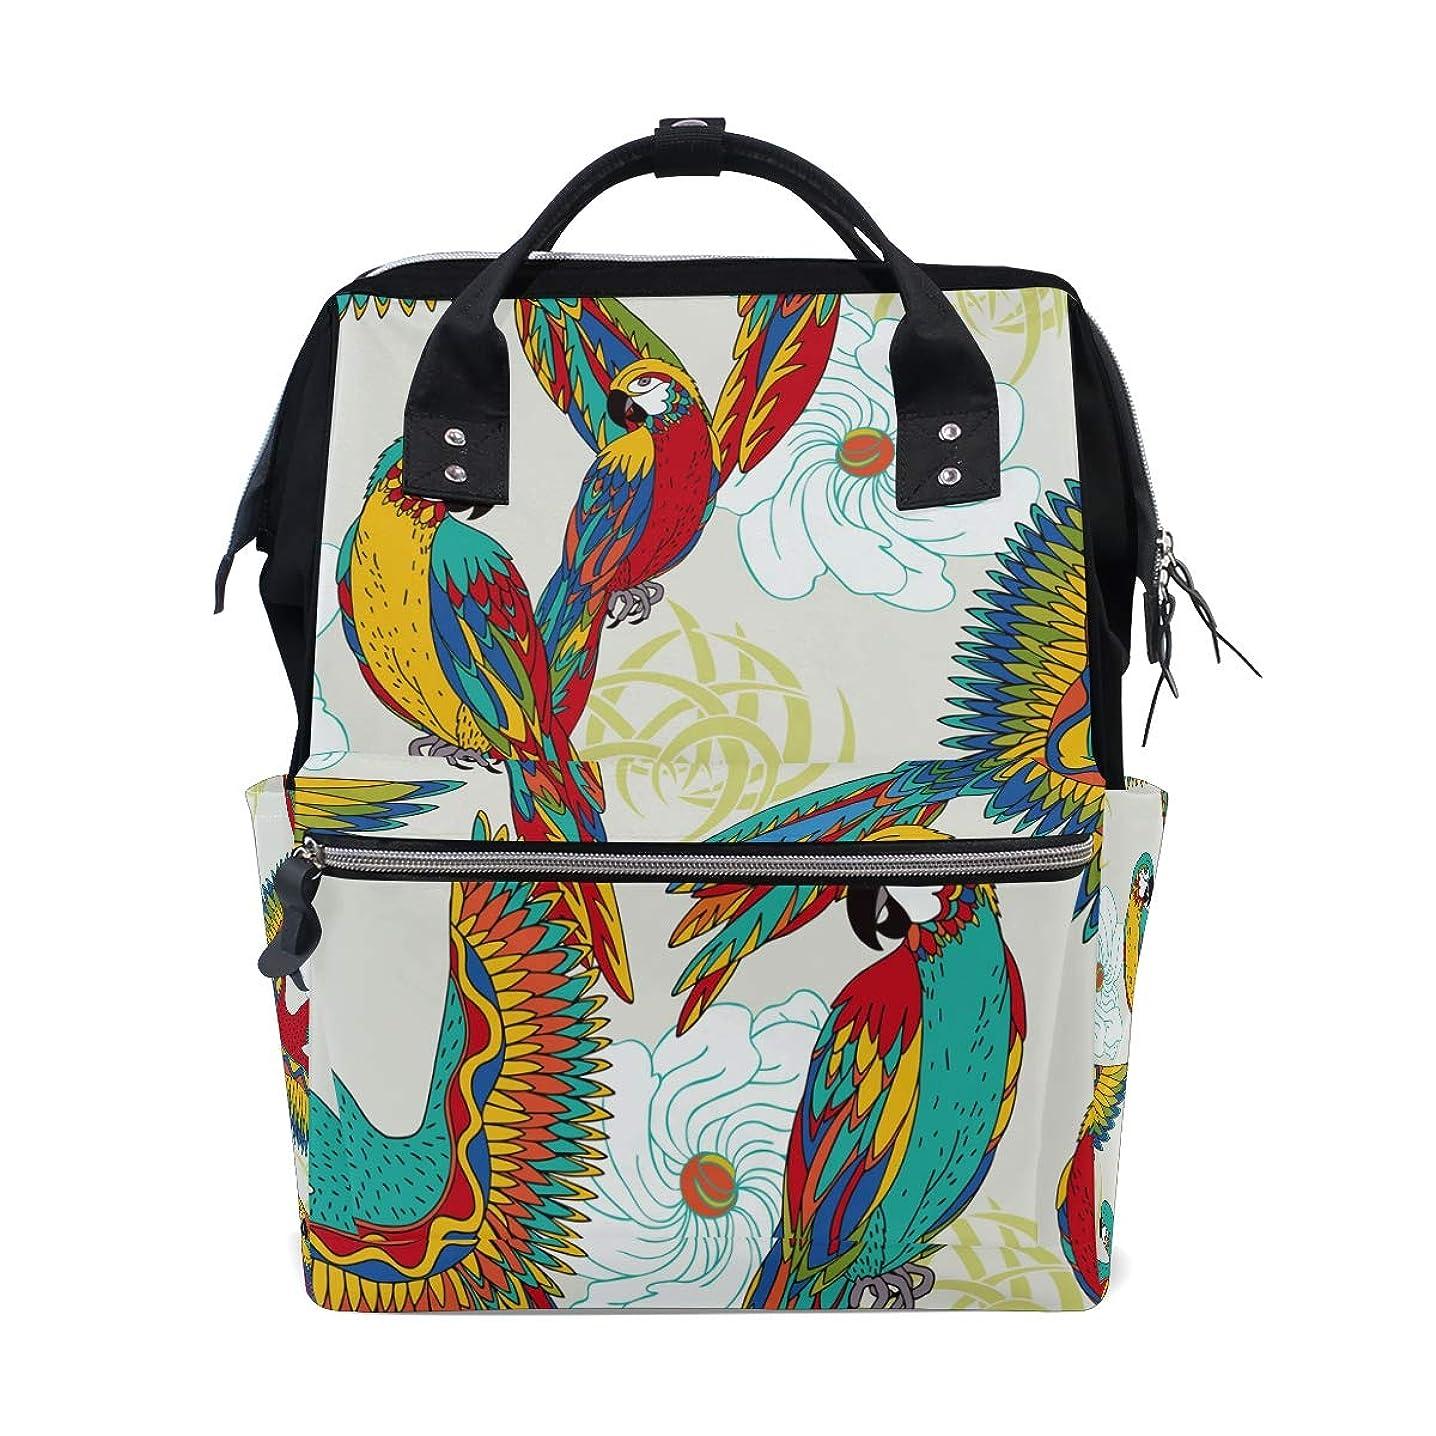 Colorful Parrot Flower School Backpack Large Capacity Mummy Bags Laptop Handbag Casual Travel Rucksack Satchel For Women Men Adult Teen Children